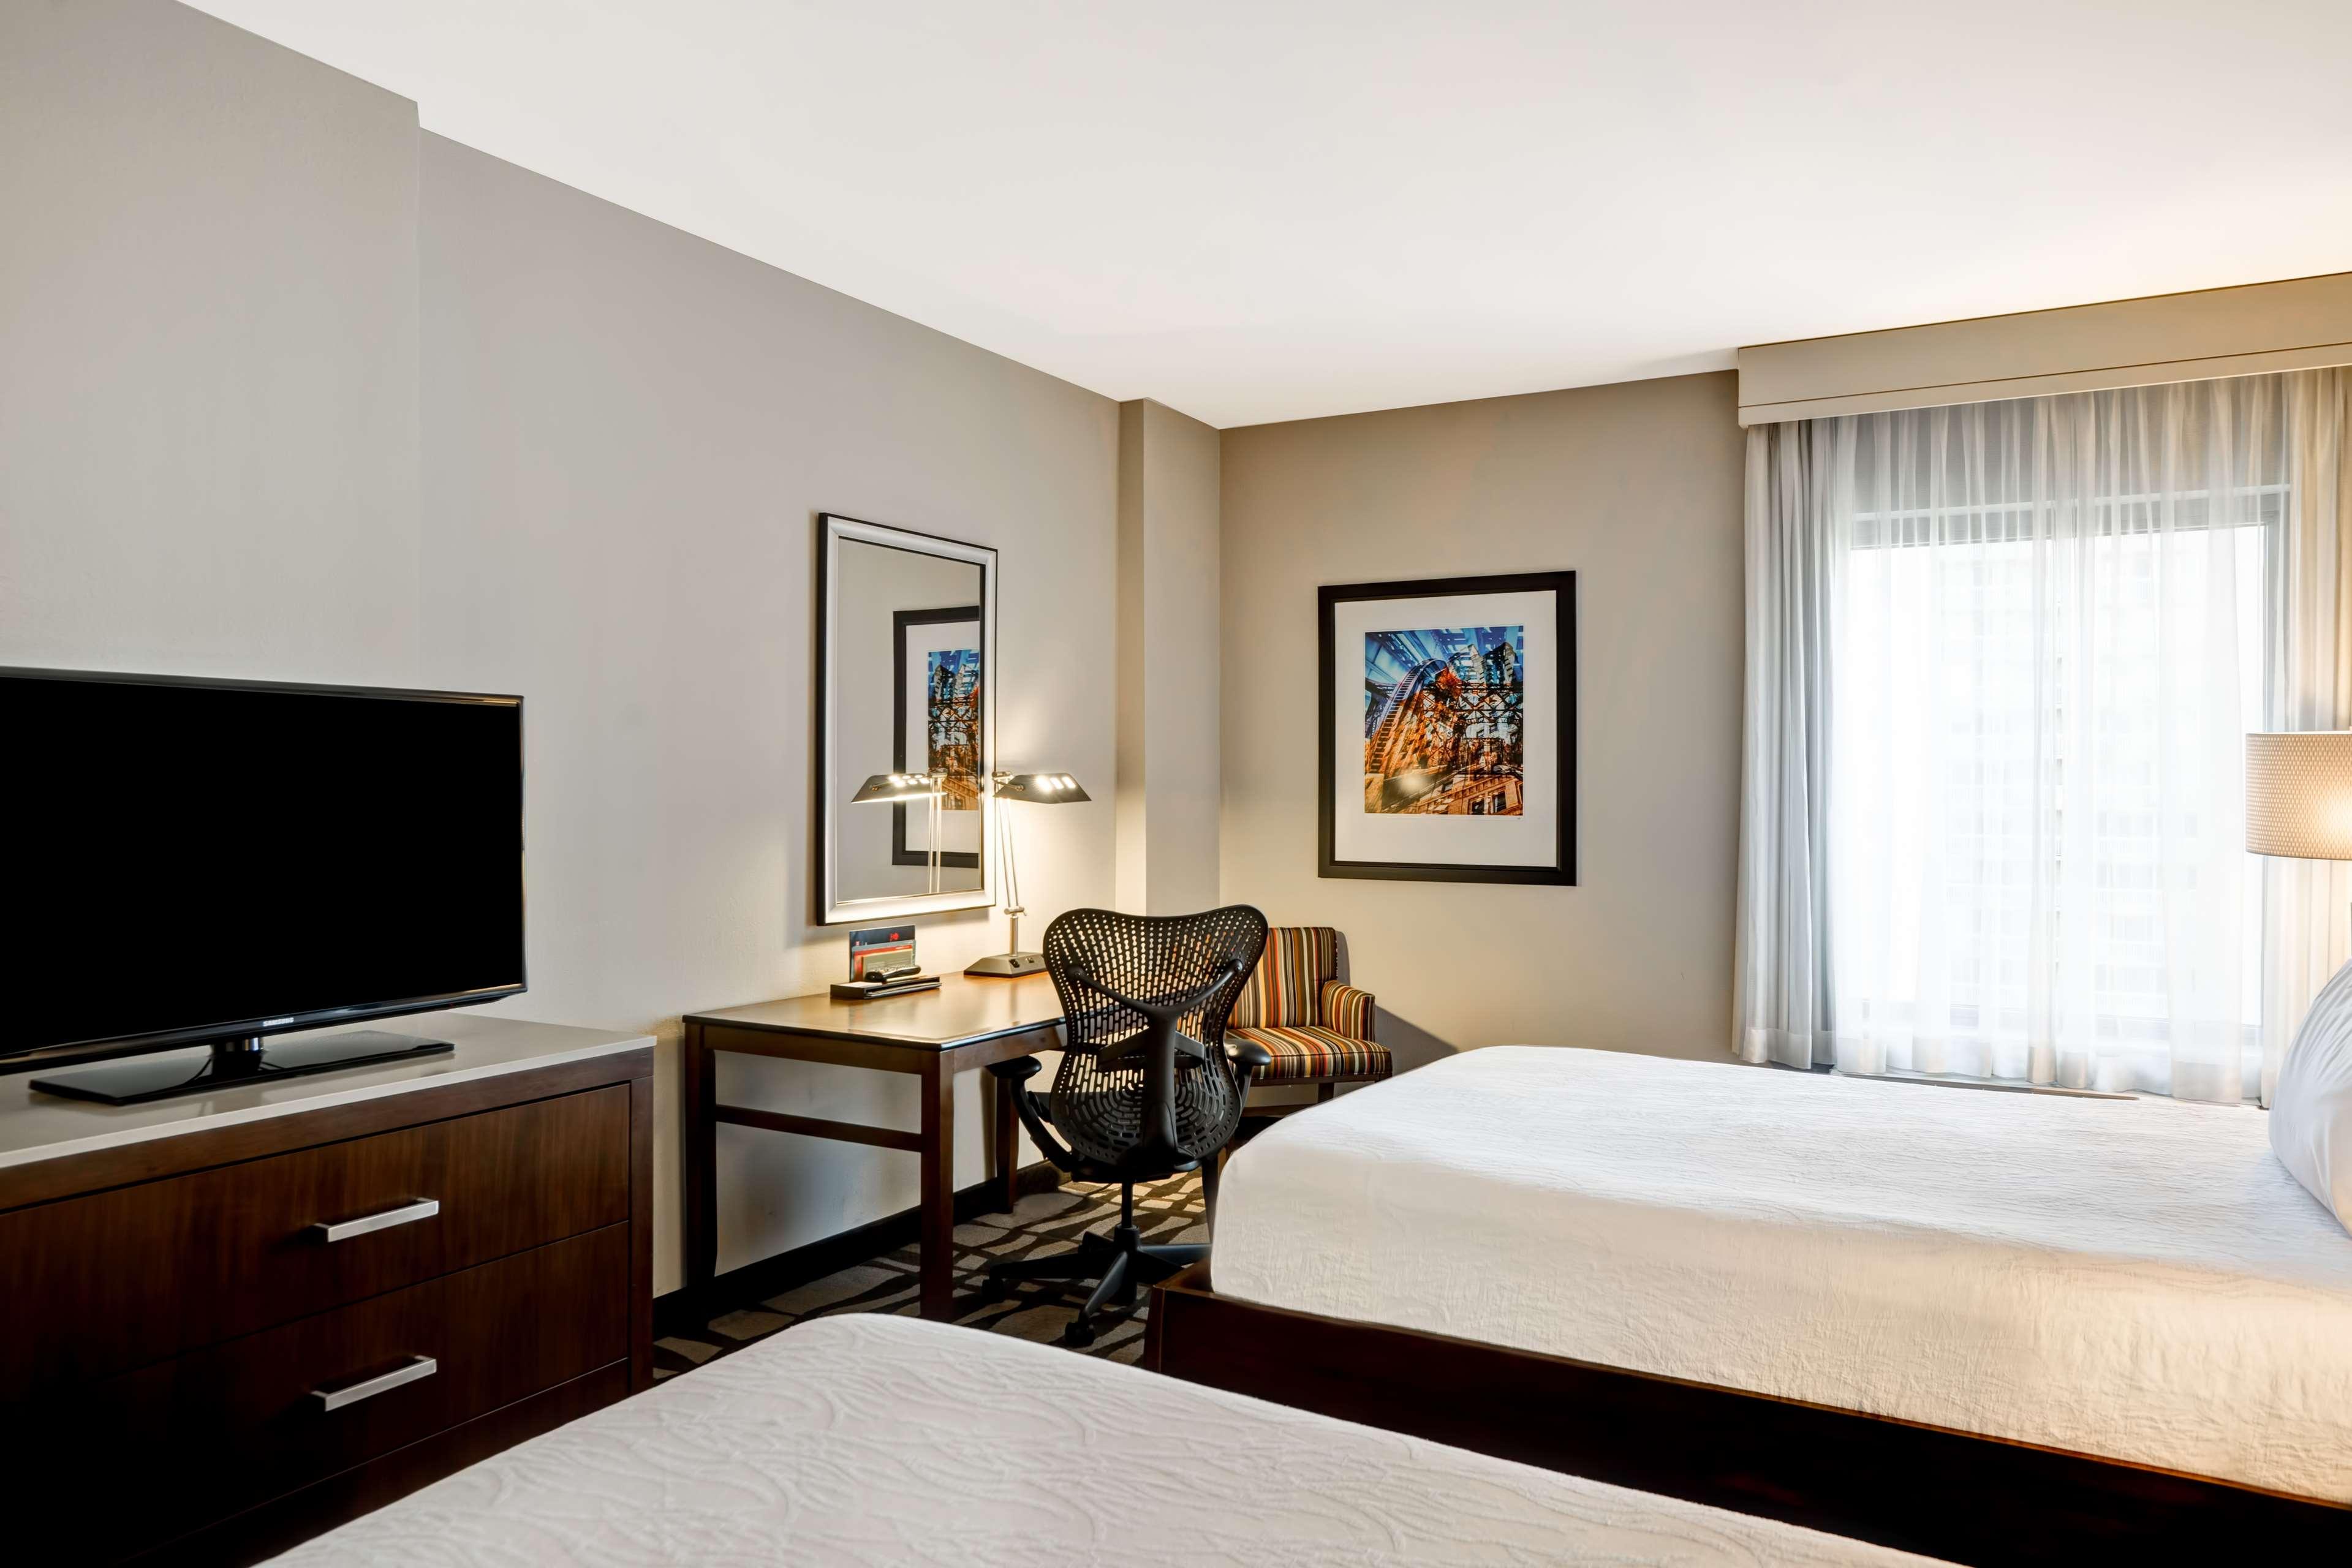 Hilton Garden Inn Chicago Downtown/Magnificent Mile image 30